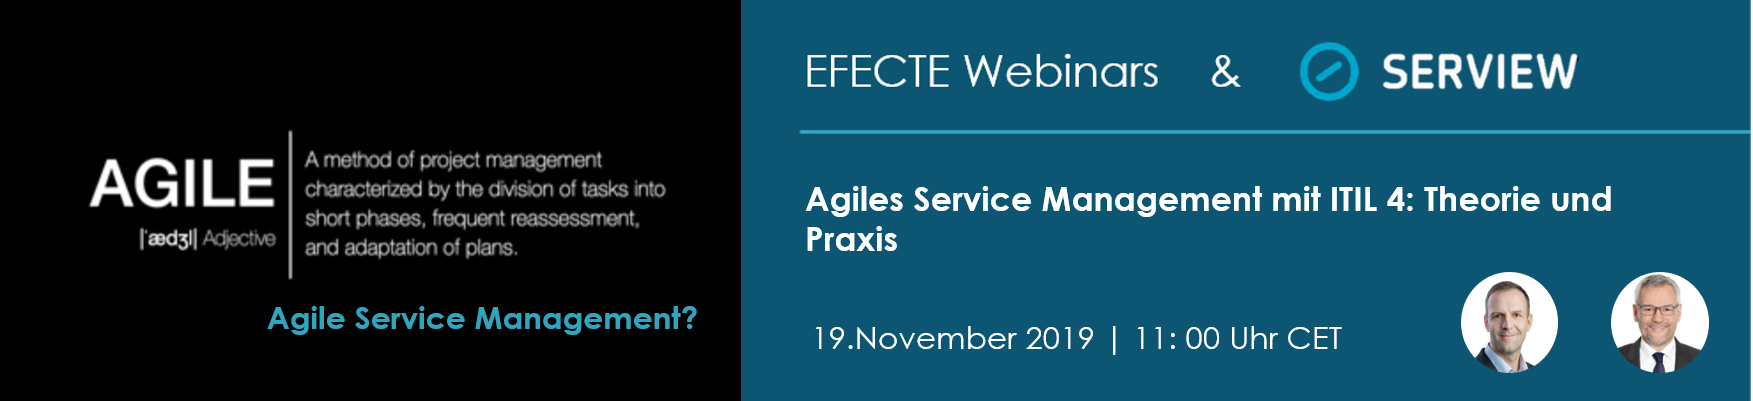 Banner agile service management mit itil4